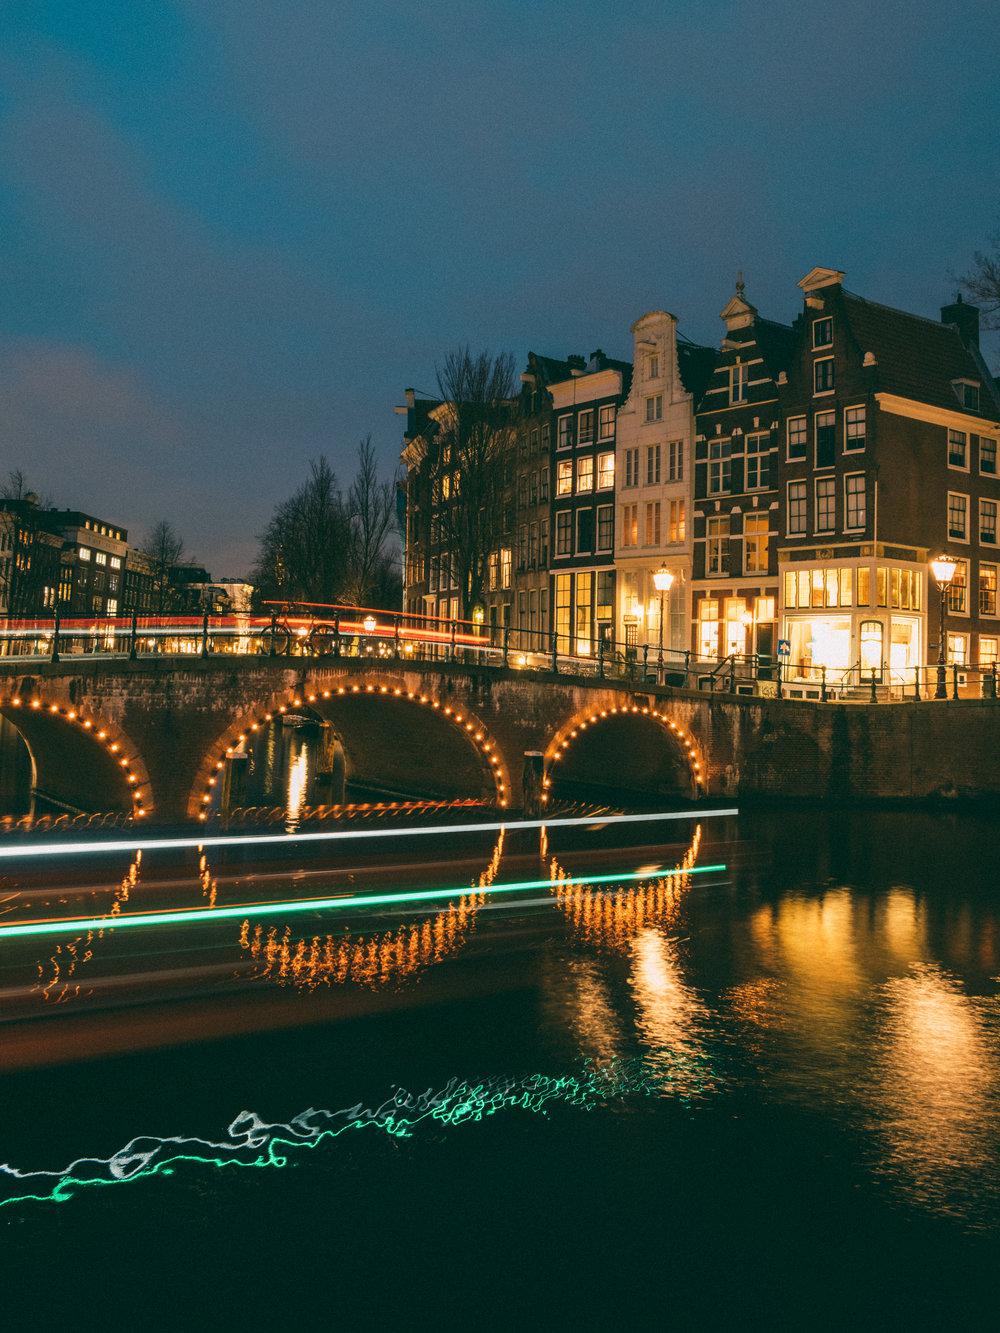 amsterdam-canal-bridge-long-exposure